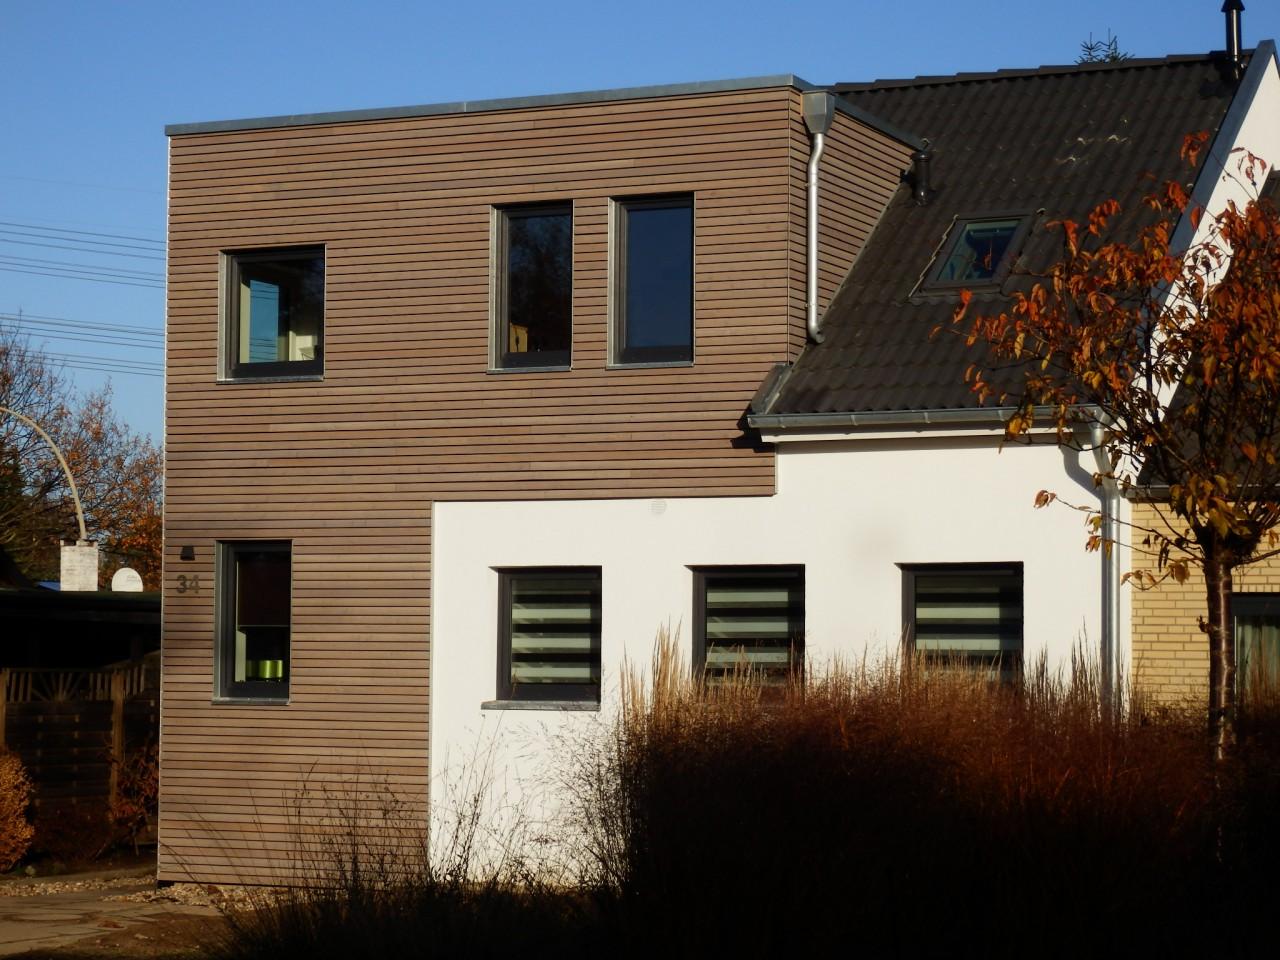 Zimmerei Nehls Holzbau Dachsanierung Flachdach Fassaden Dachdecker ...